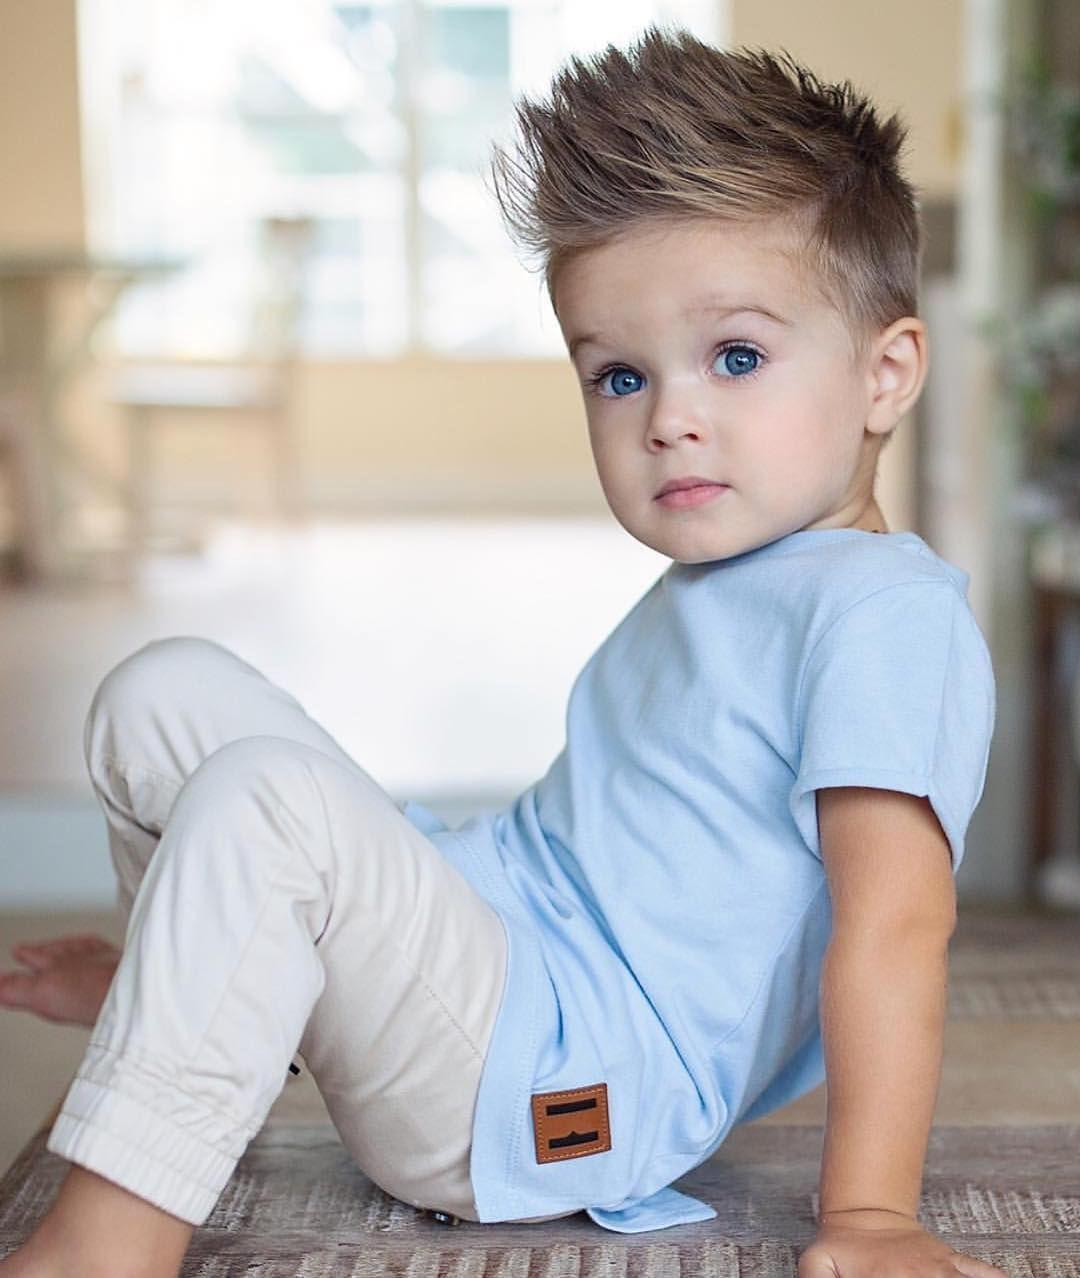 Trendy haircuts 2019